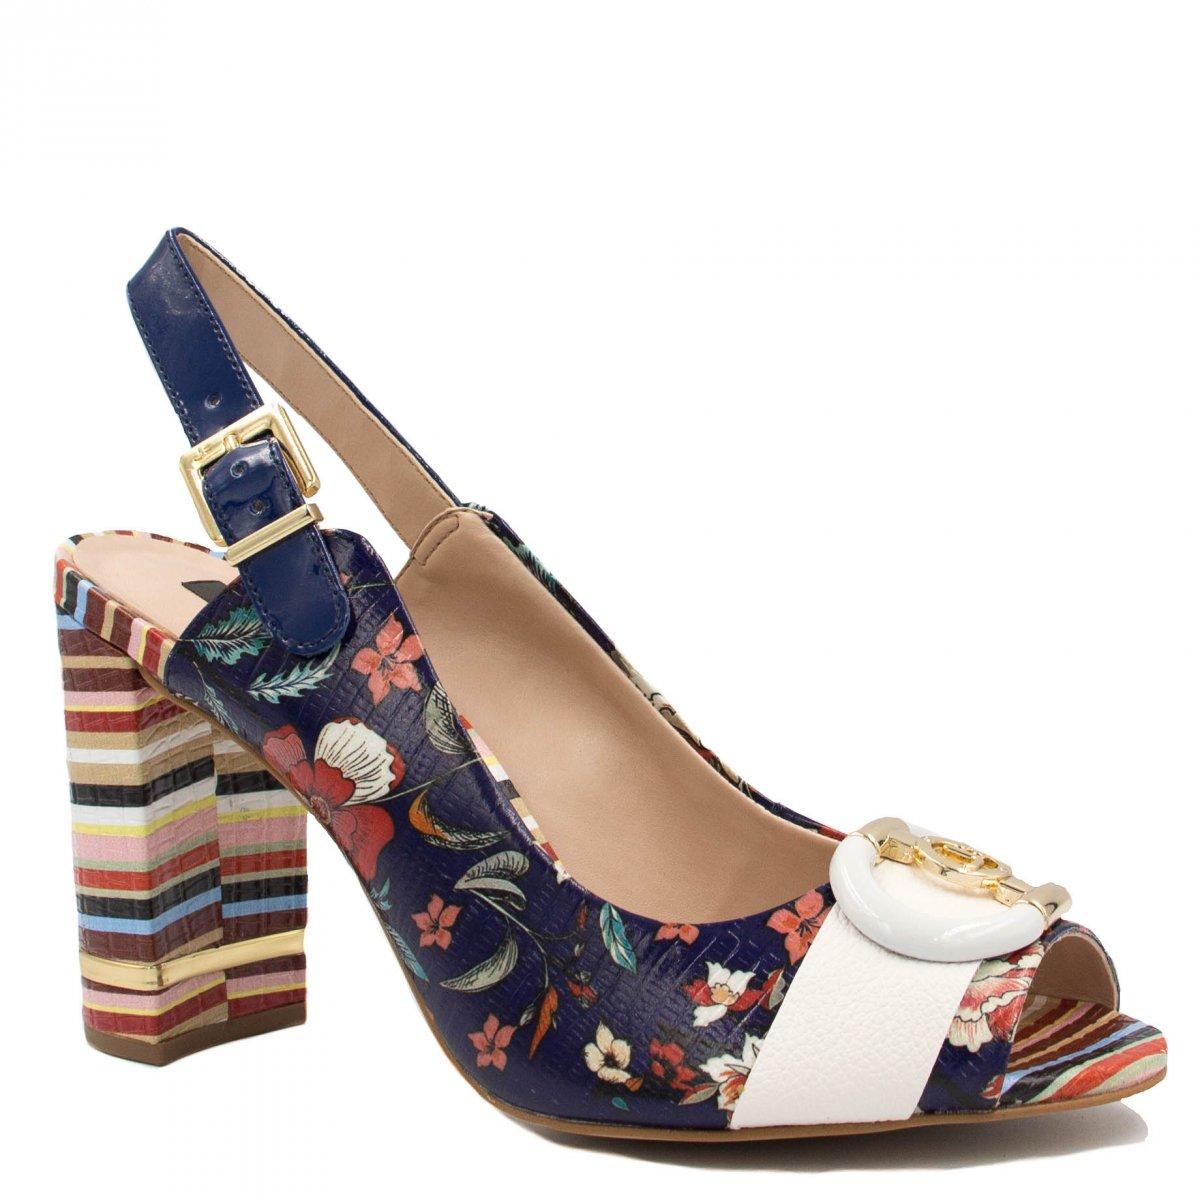 3269e9b90f Sapato Jorge Bischoff Chanel Verniz Metal 21054041